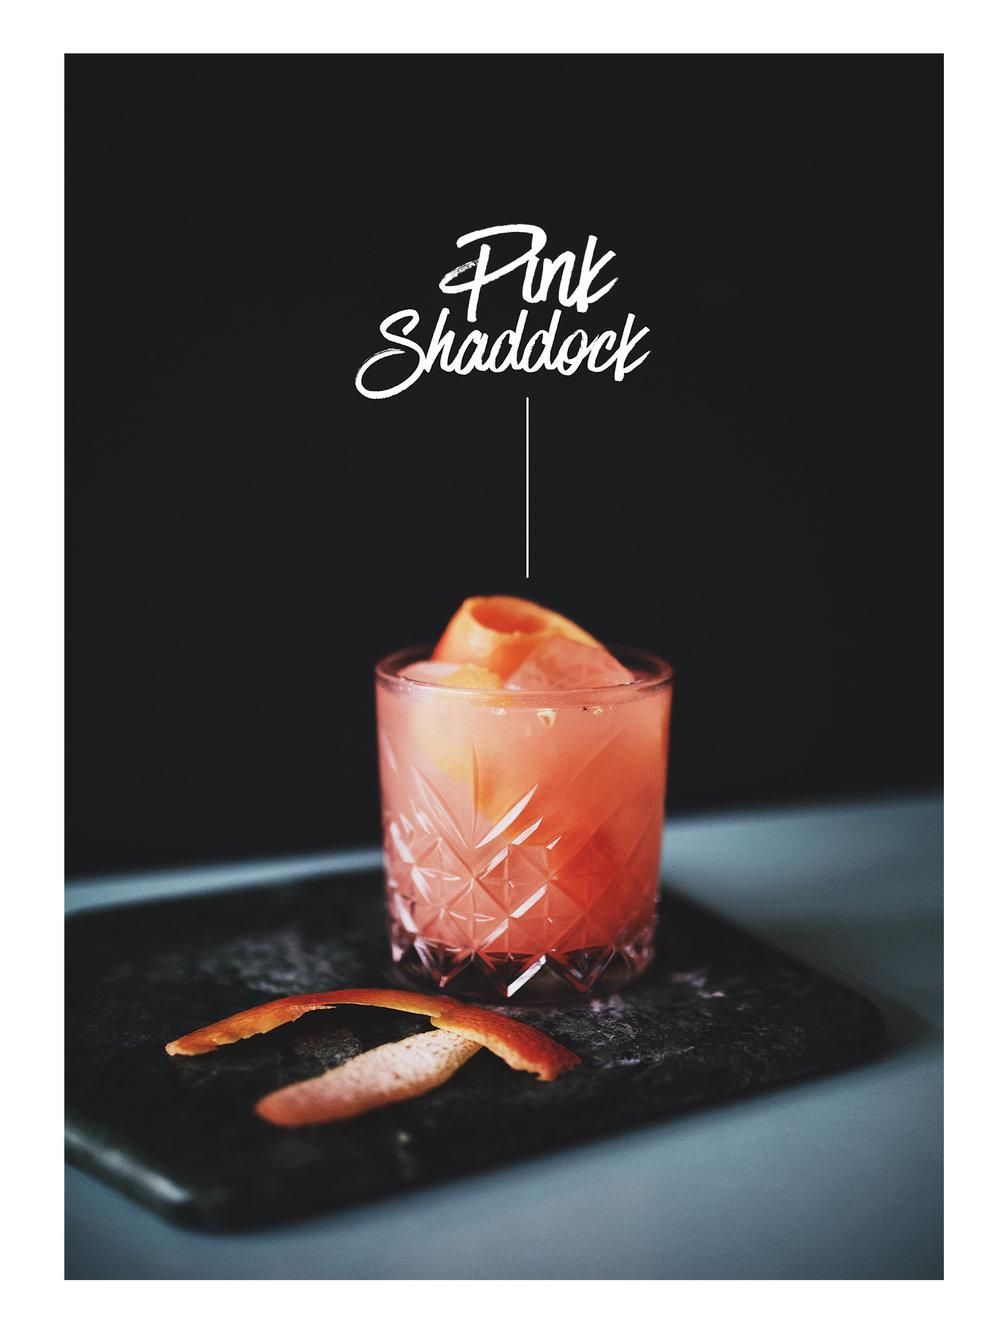 Klassiker 3 Drink-+PINK+SHADDOCK.jpg